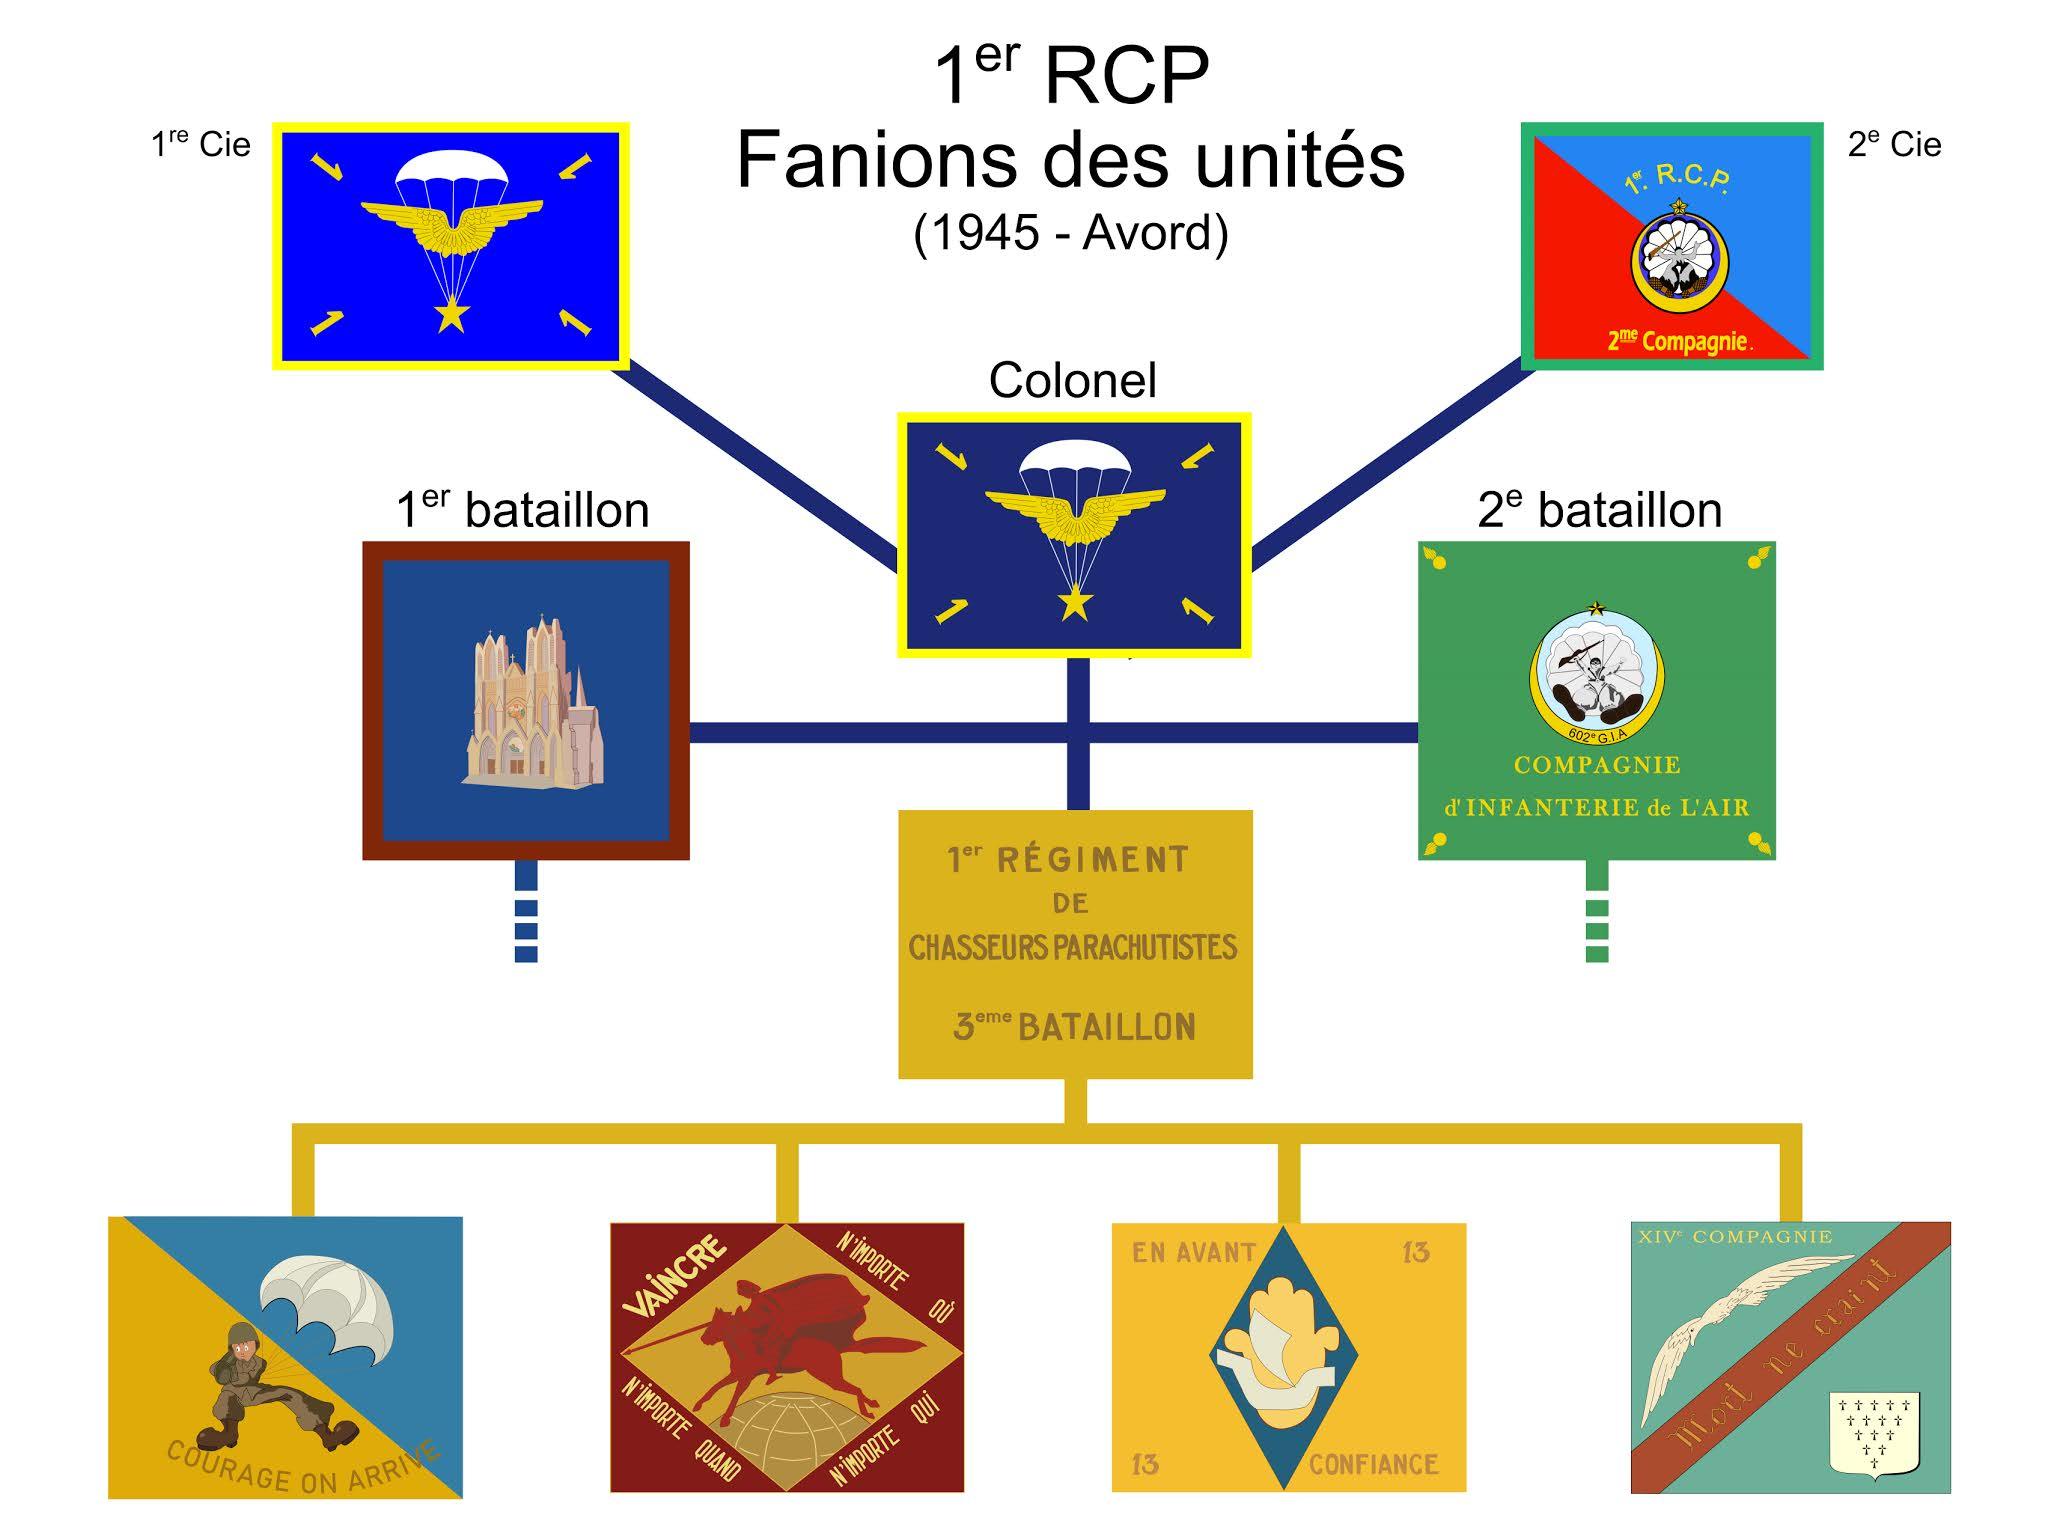 1er RCP - Fanions des compagnies. 1er%2BRCP%2BFanions%2BAvord